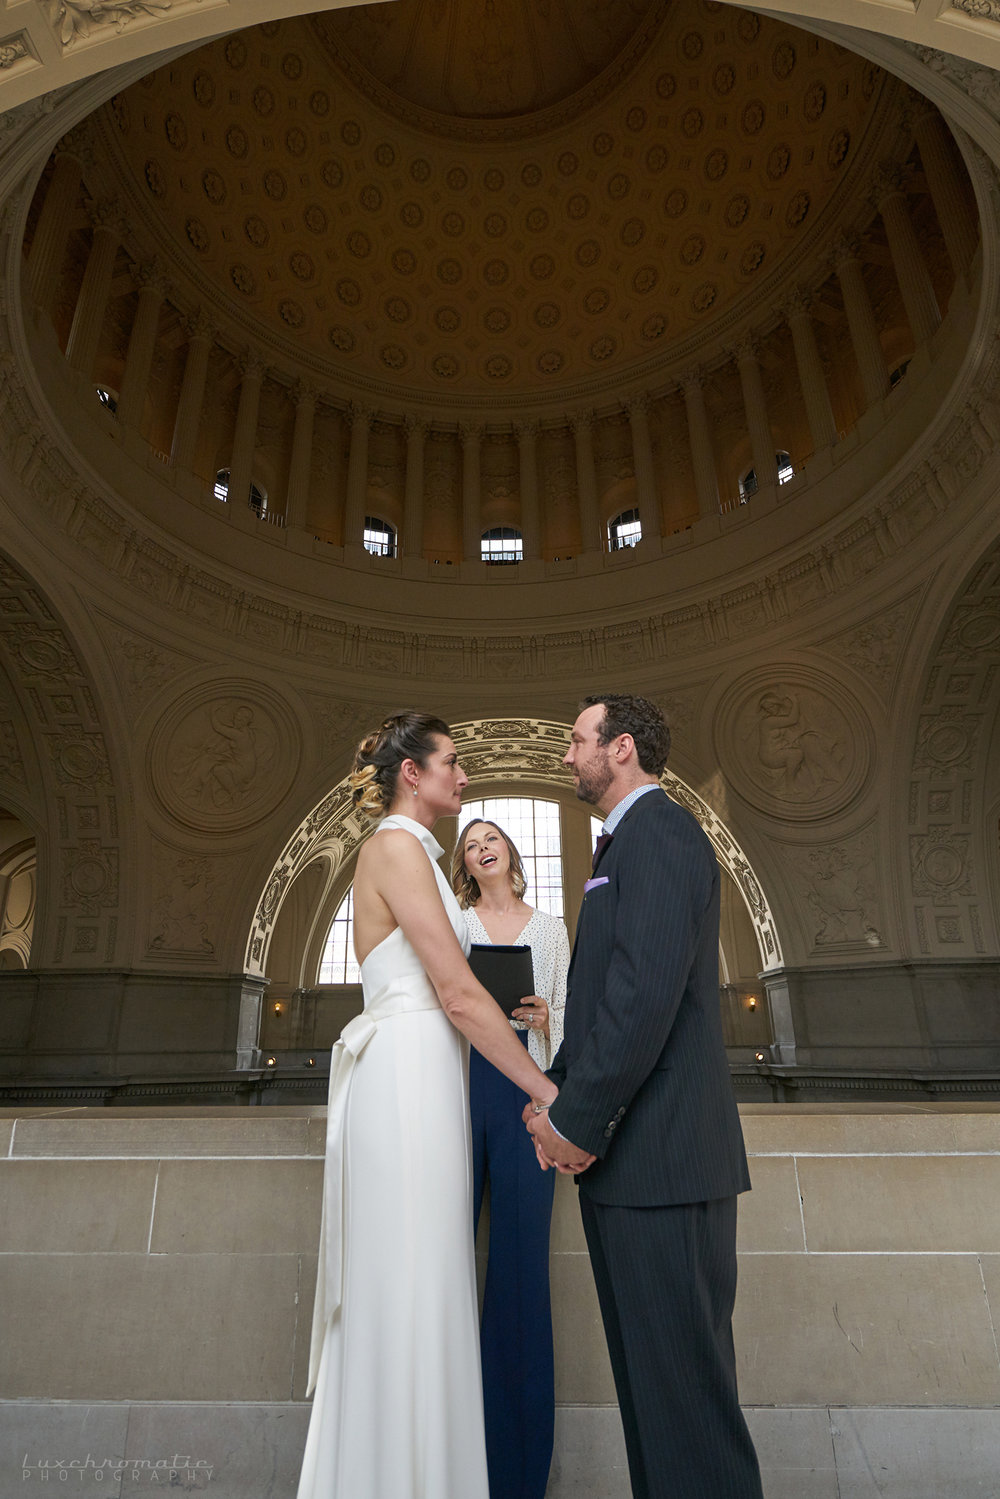 040318_Erin_Brent_0066-weddingdress-bride-weddingphotography-weddingphotographer-bridal-groom-wedding-engagementring-proposal-brides-elopement-sonyalpha-sony-sonya9-sonya7riii-sanfrancisco-sf-bayarea-photographer-profoto-city-hall.jpg